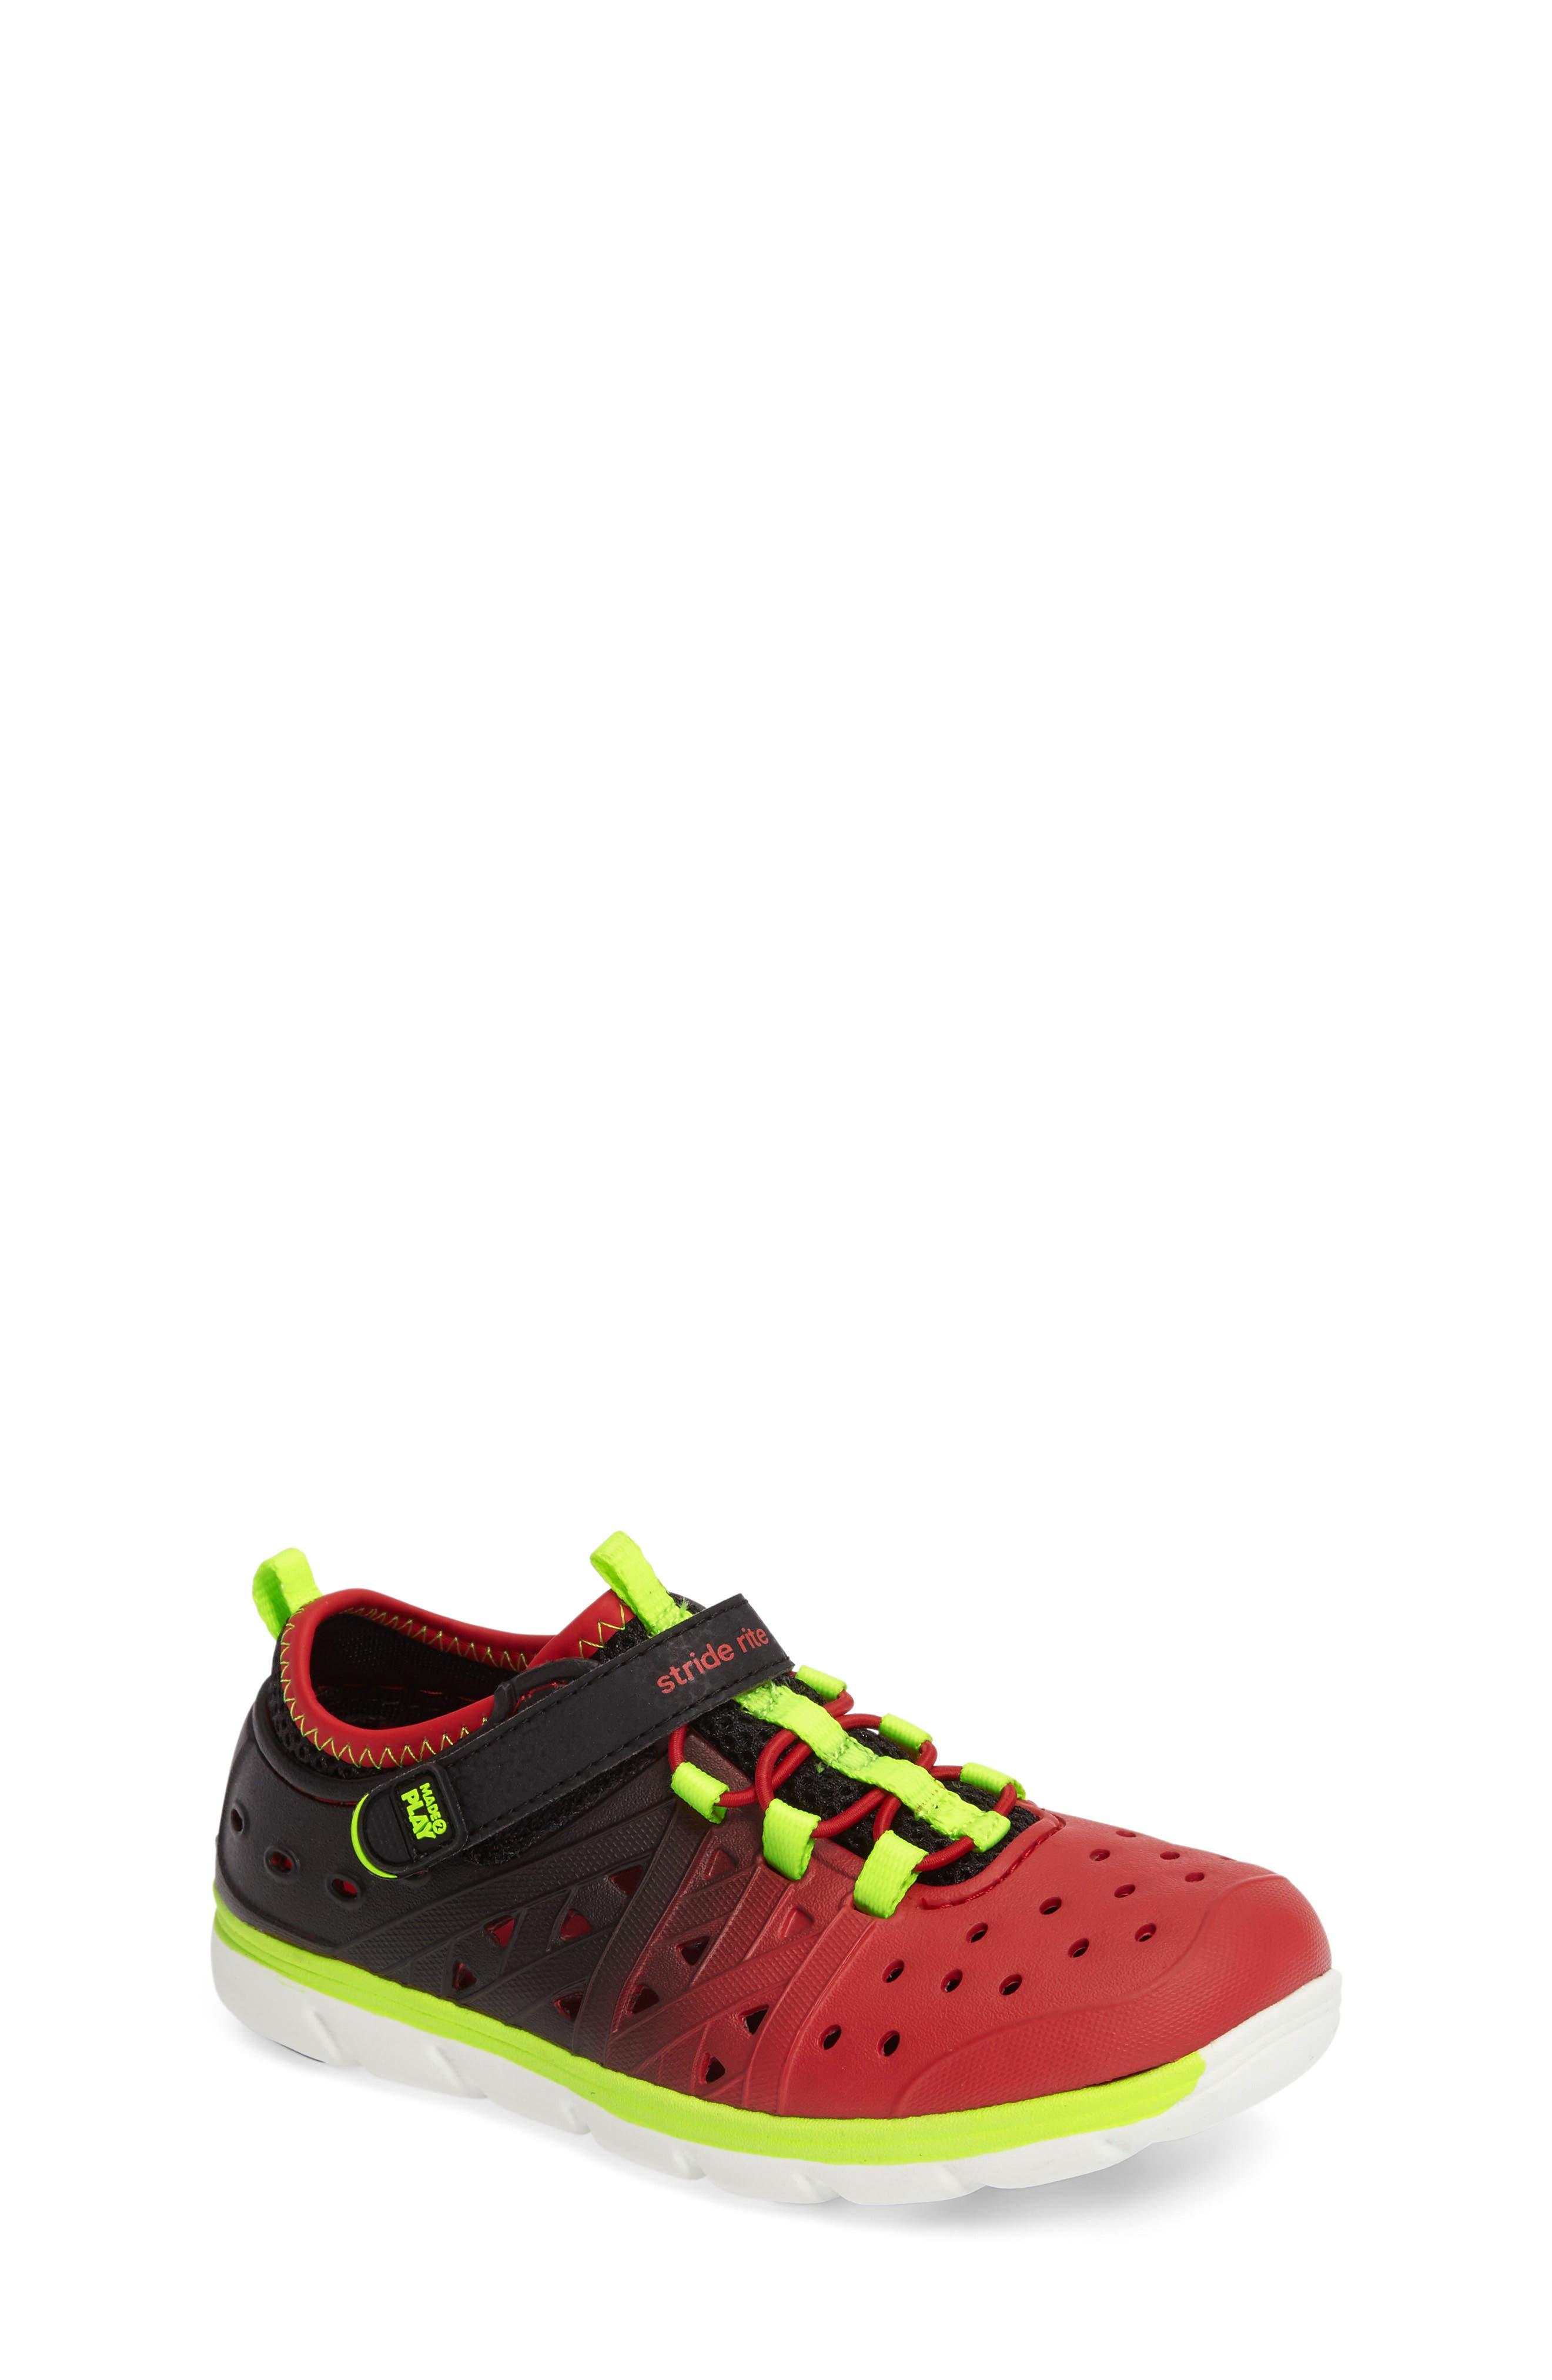 Made2Play<sup>®</sup> Phibian Sneaker,                             Main thumbnail 1, color,                             001